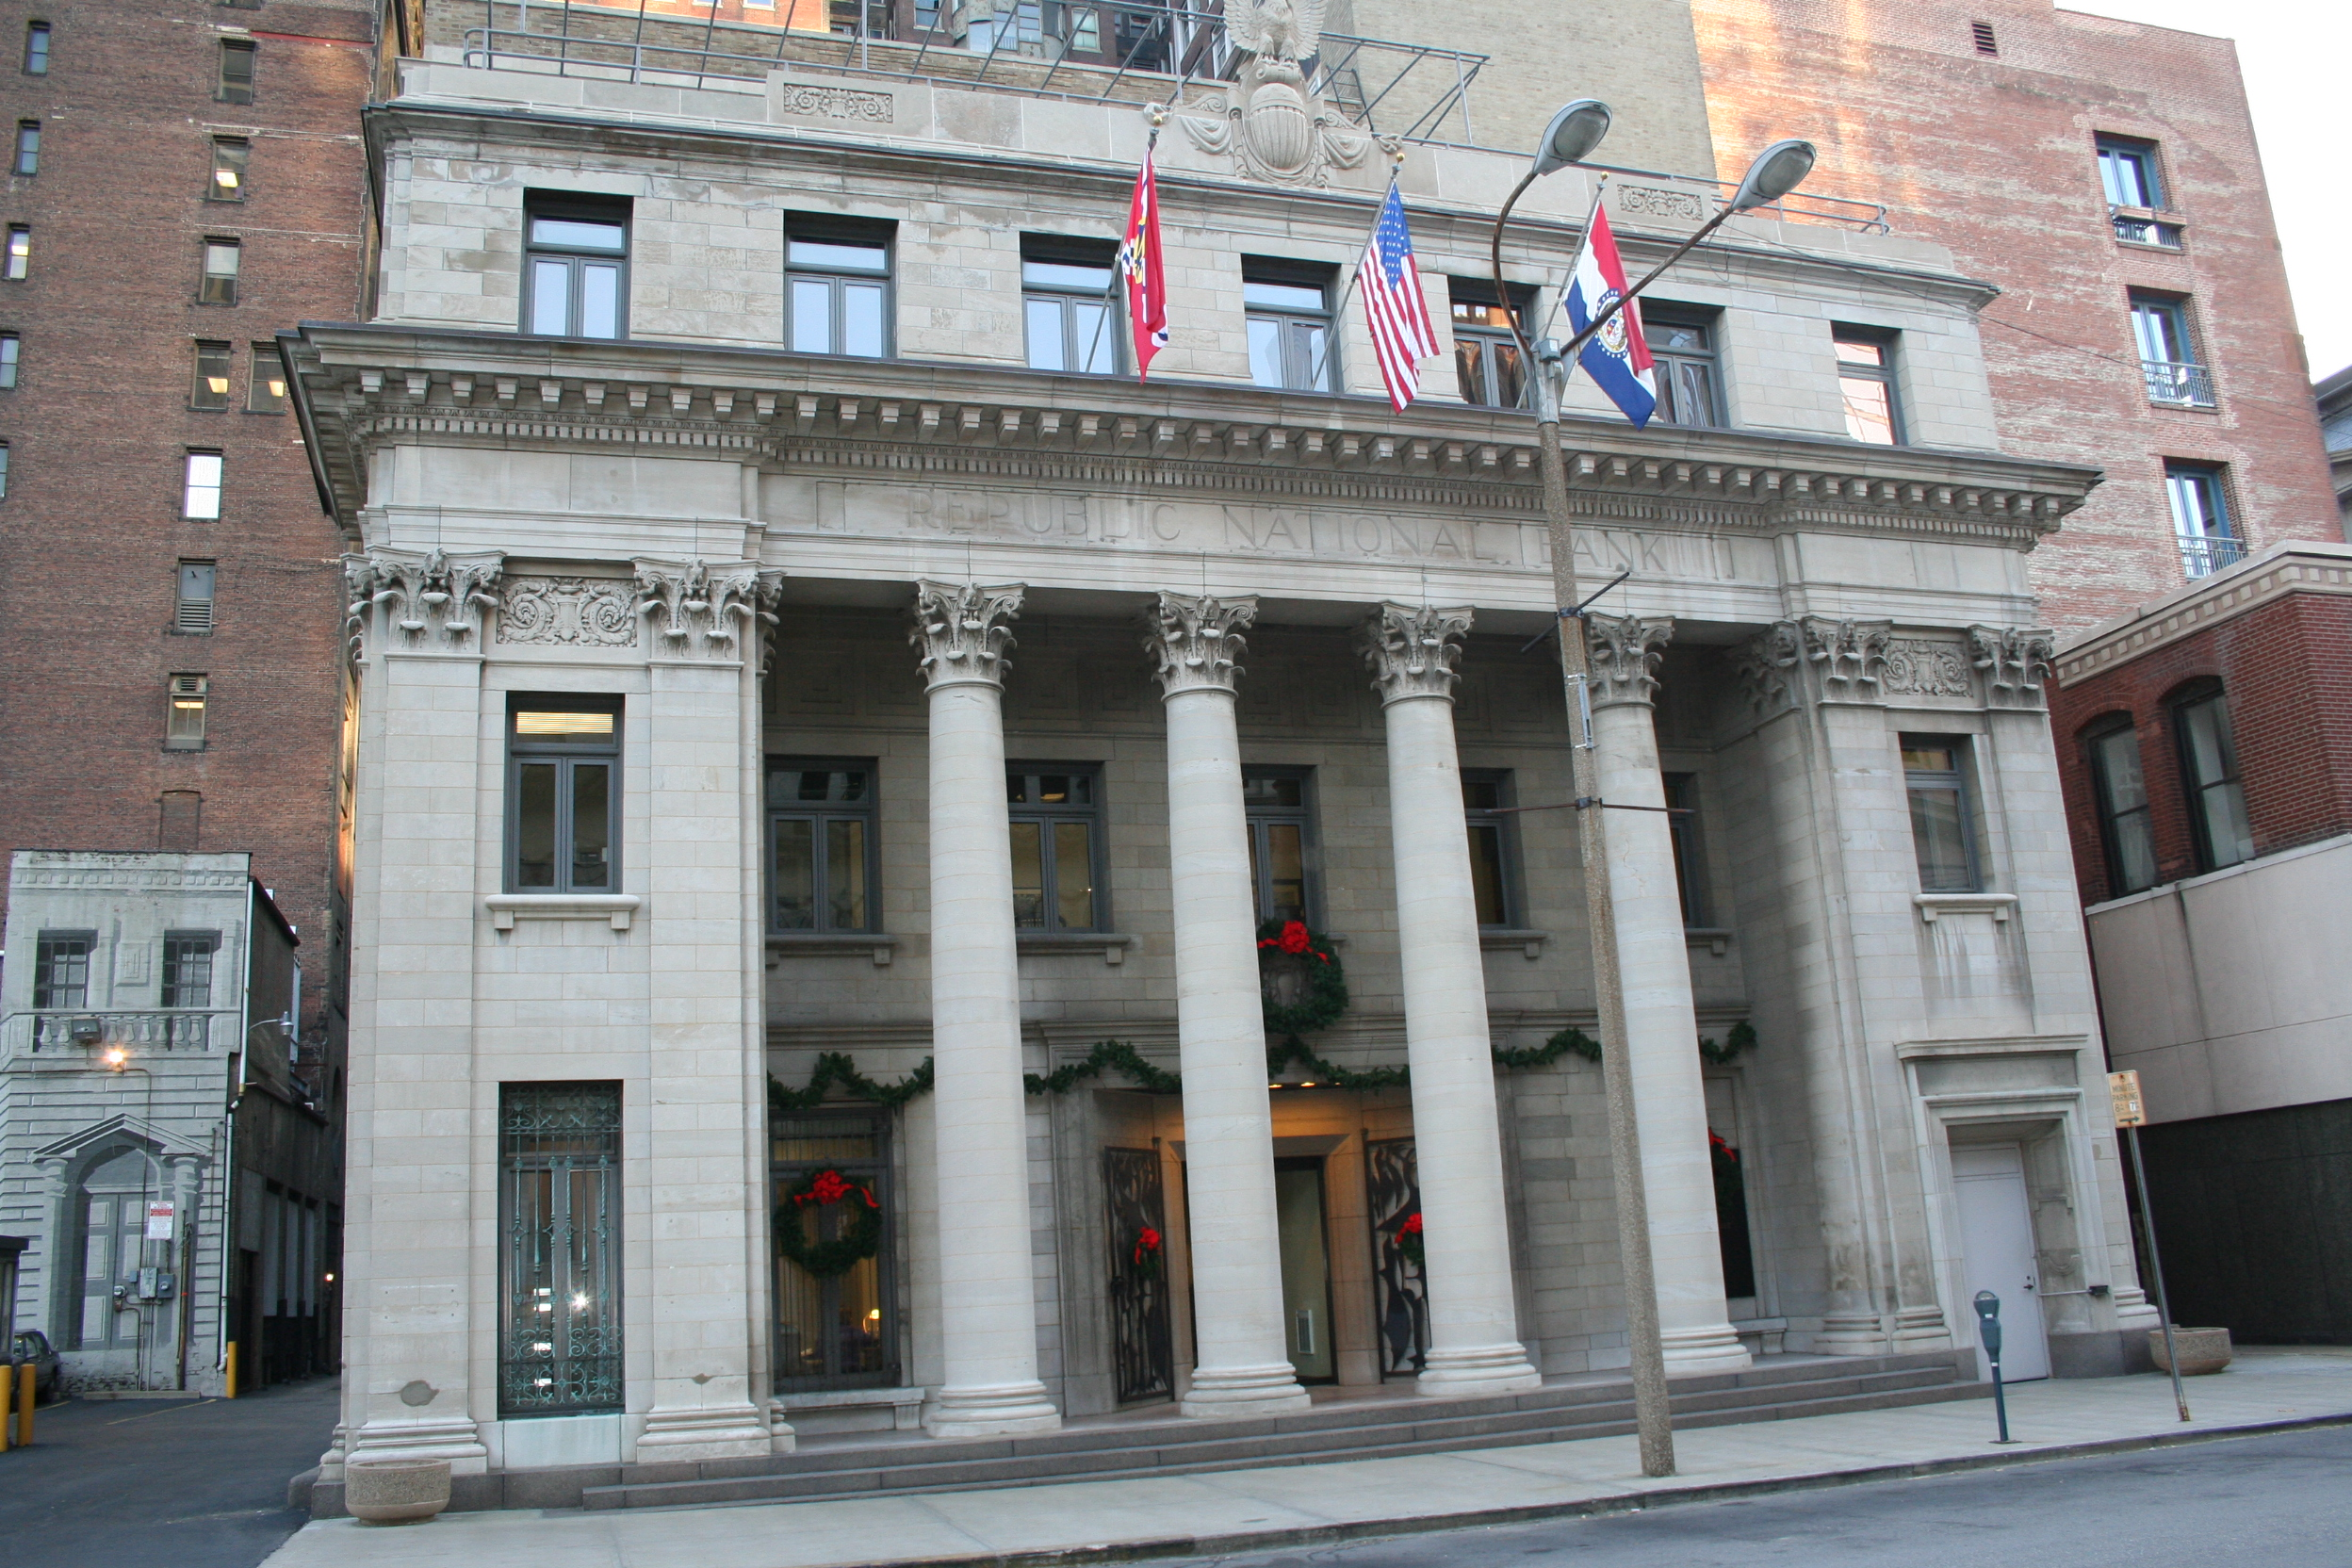 Old Mutual Bank Building - City Landmark #97